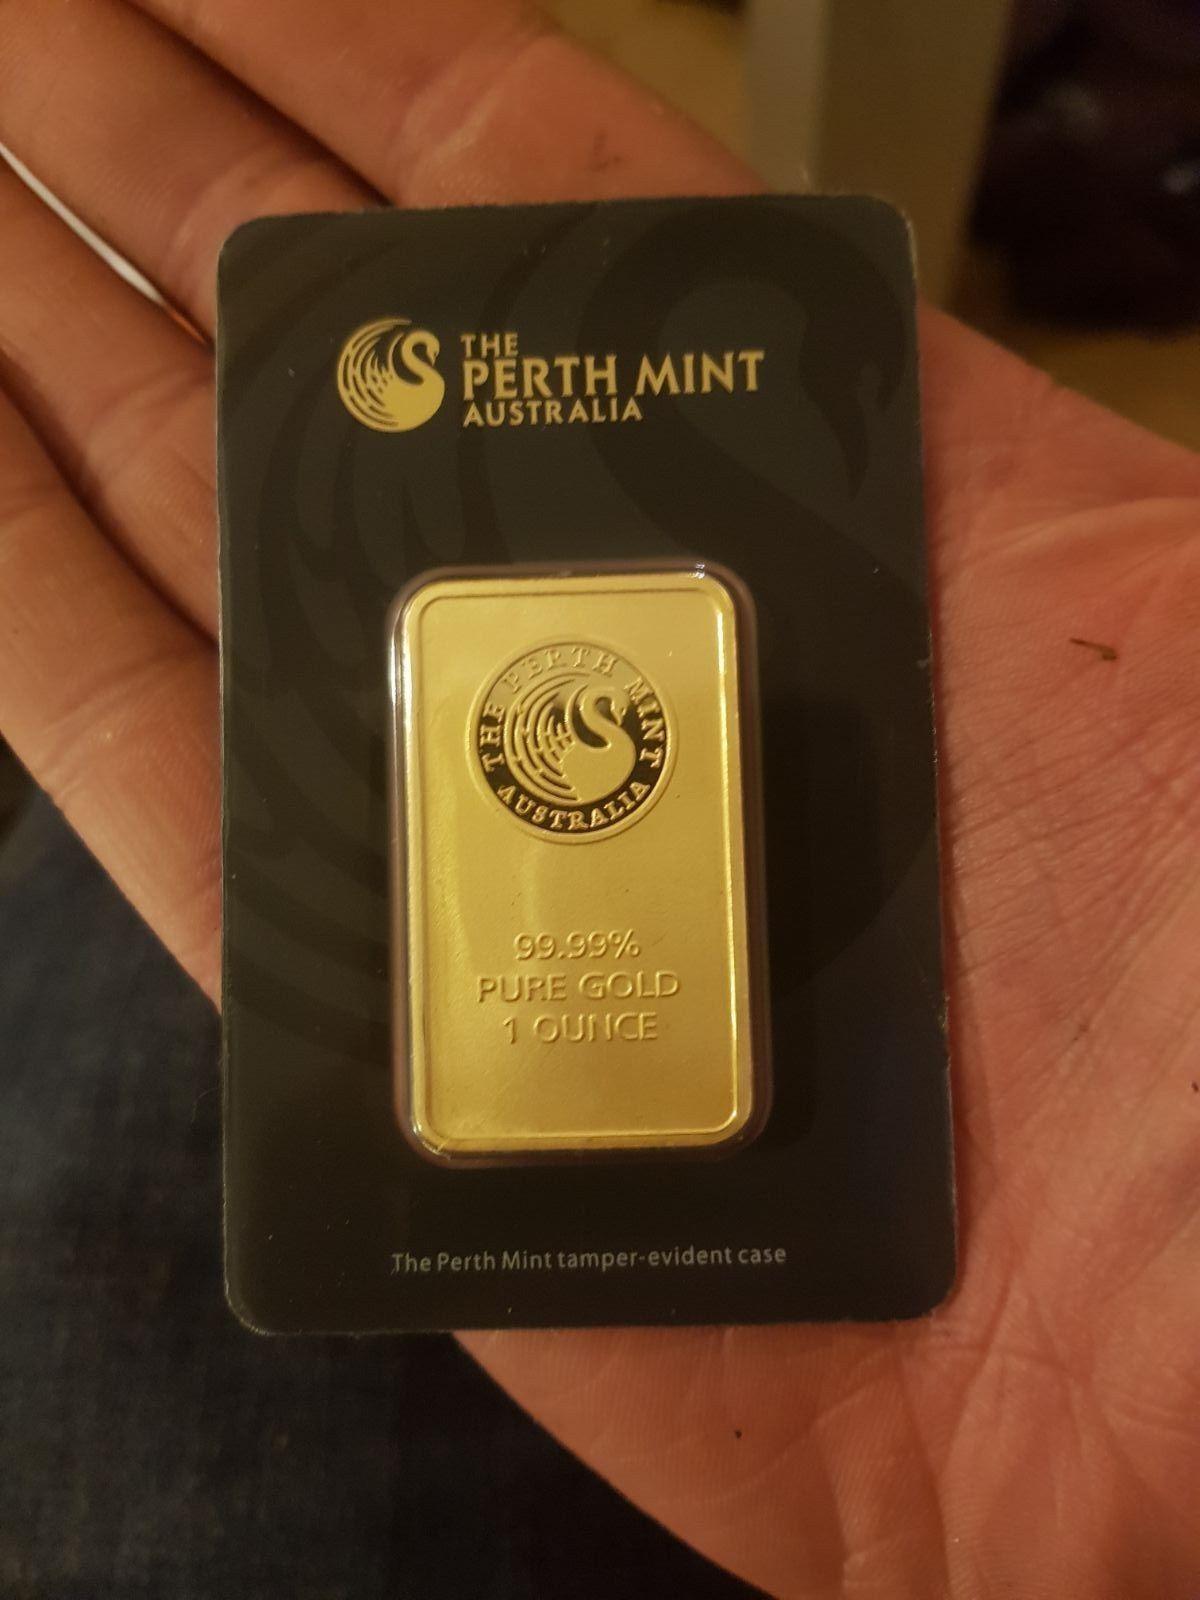 1oz Perth Mint Gold Bullion Bar 1 Ounce In Assay Sealed Jeweler Verified 14kgoldjewelry Gold Bullion Bars Gold Bullion Gold Money